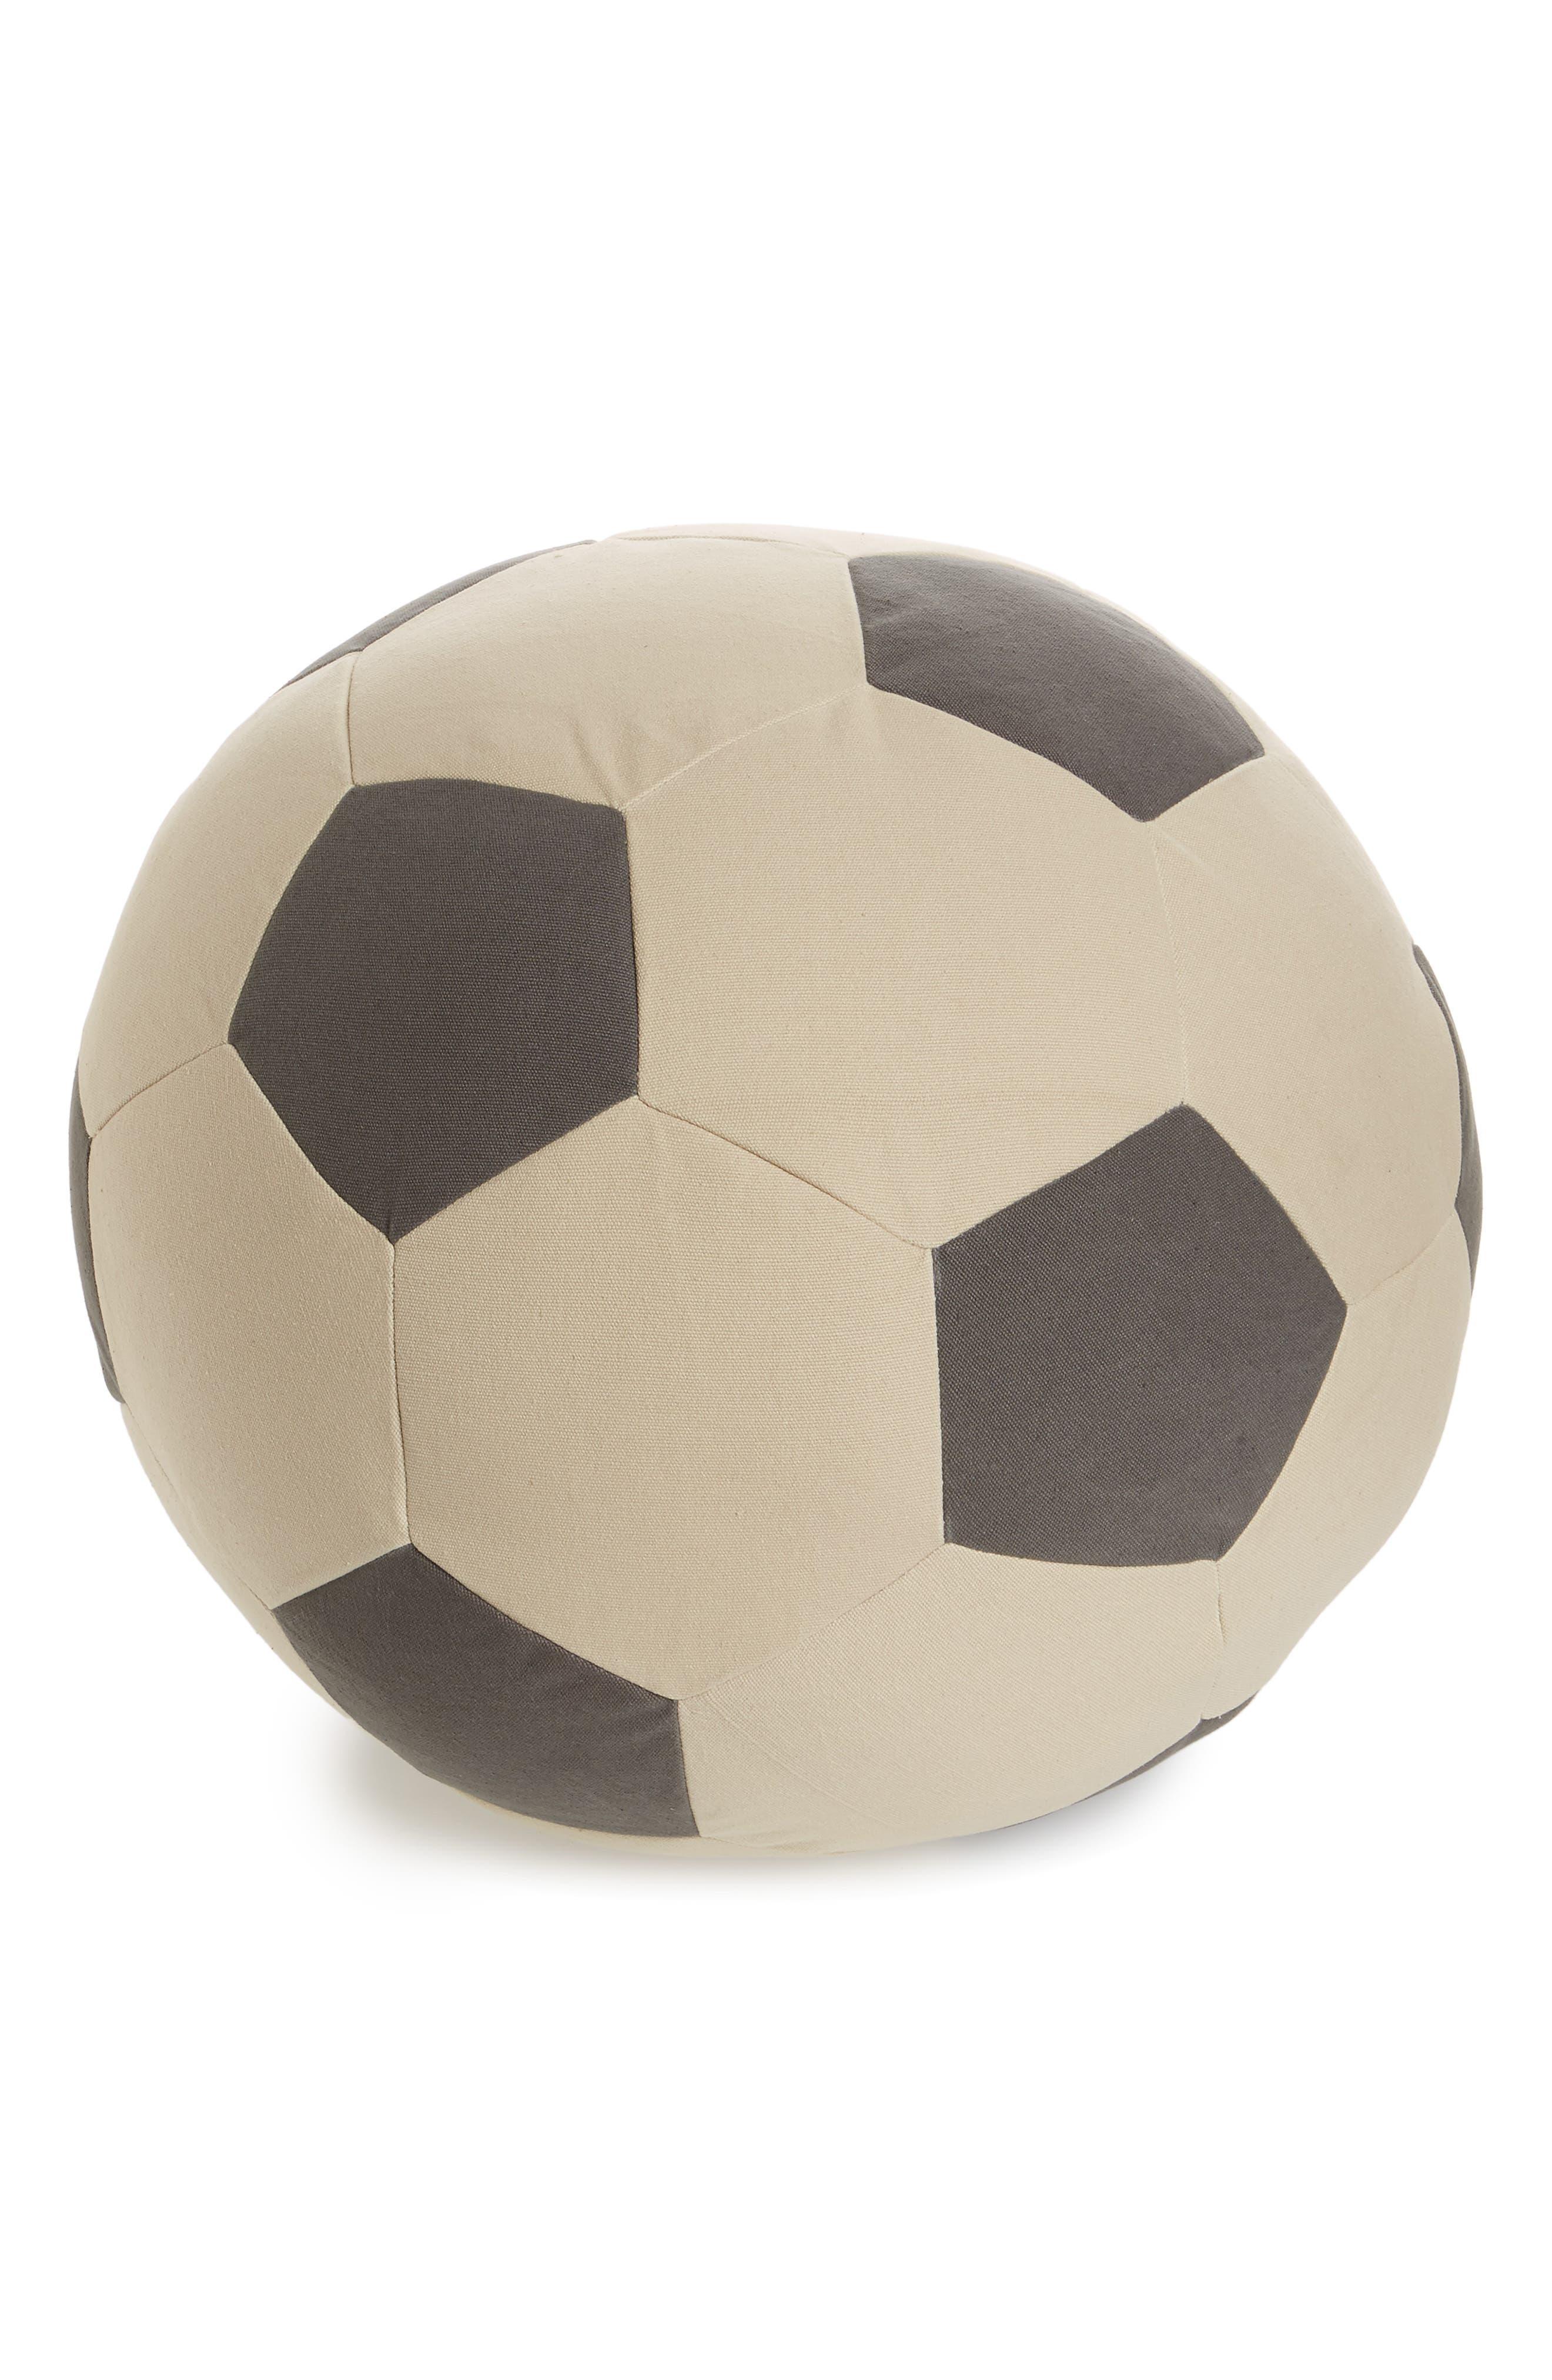 Lil Pyar Soccer Pouf